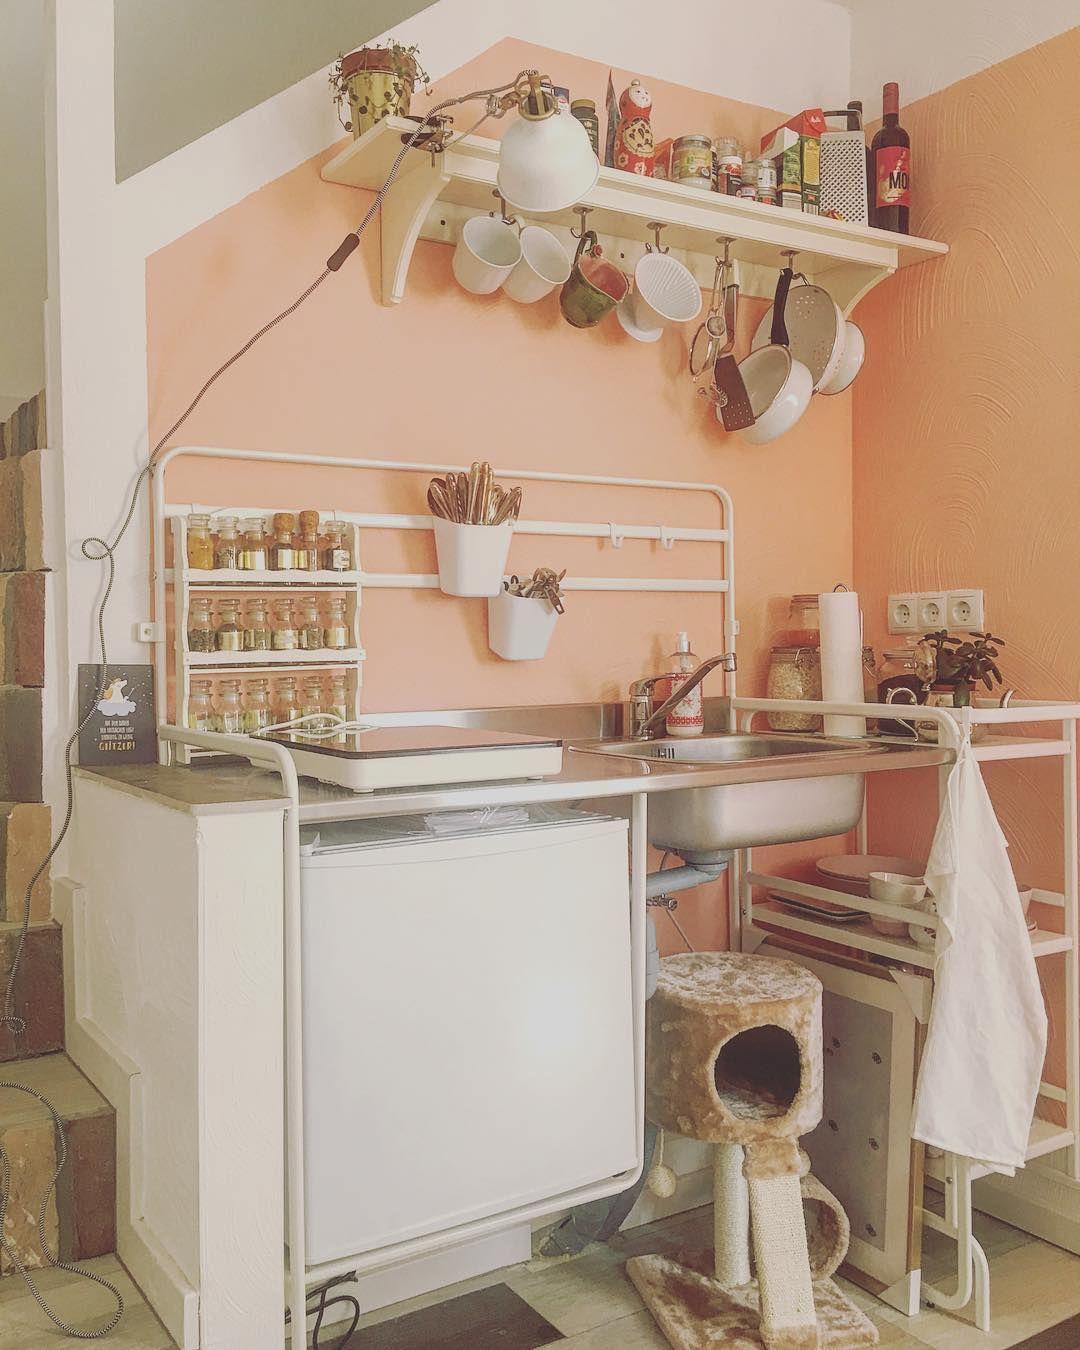 Sunnersta Mini Kitchen Ikea Original Credit Lady Or Tramp On